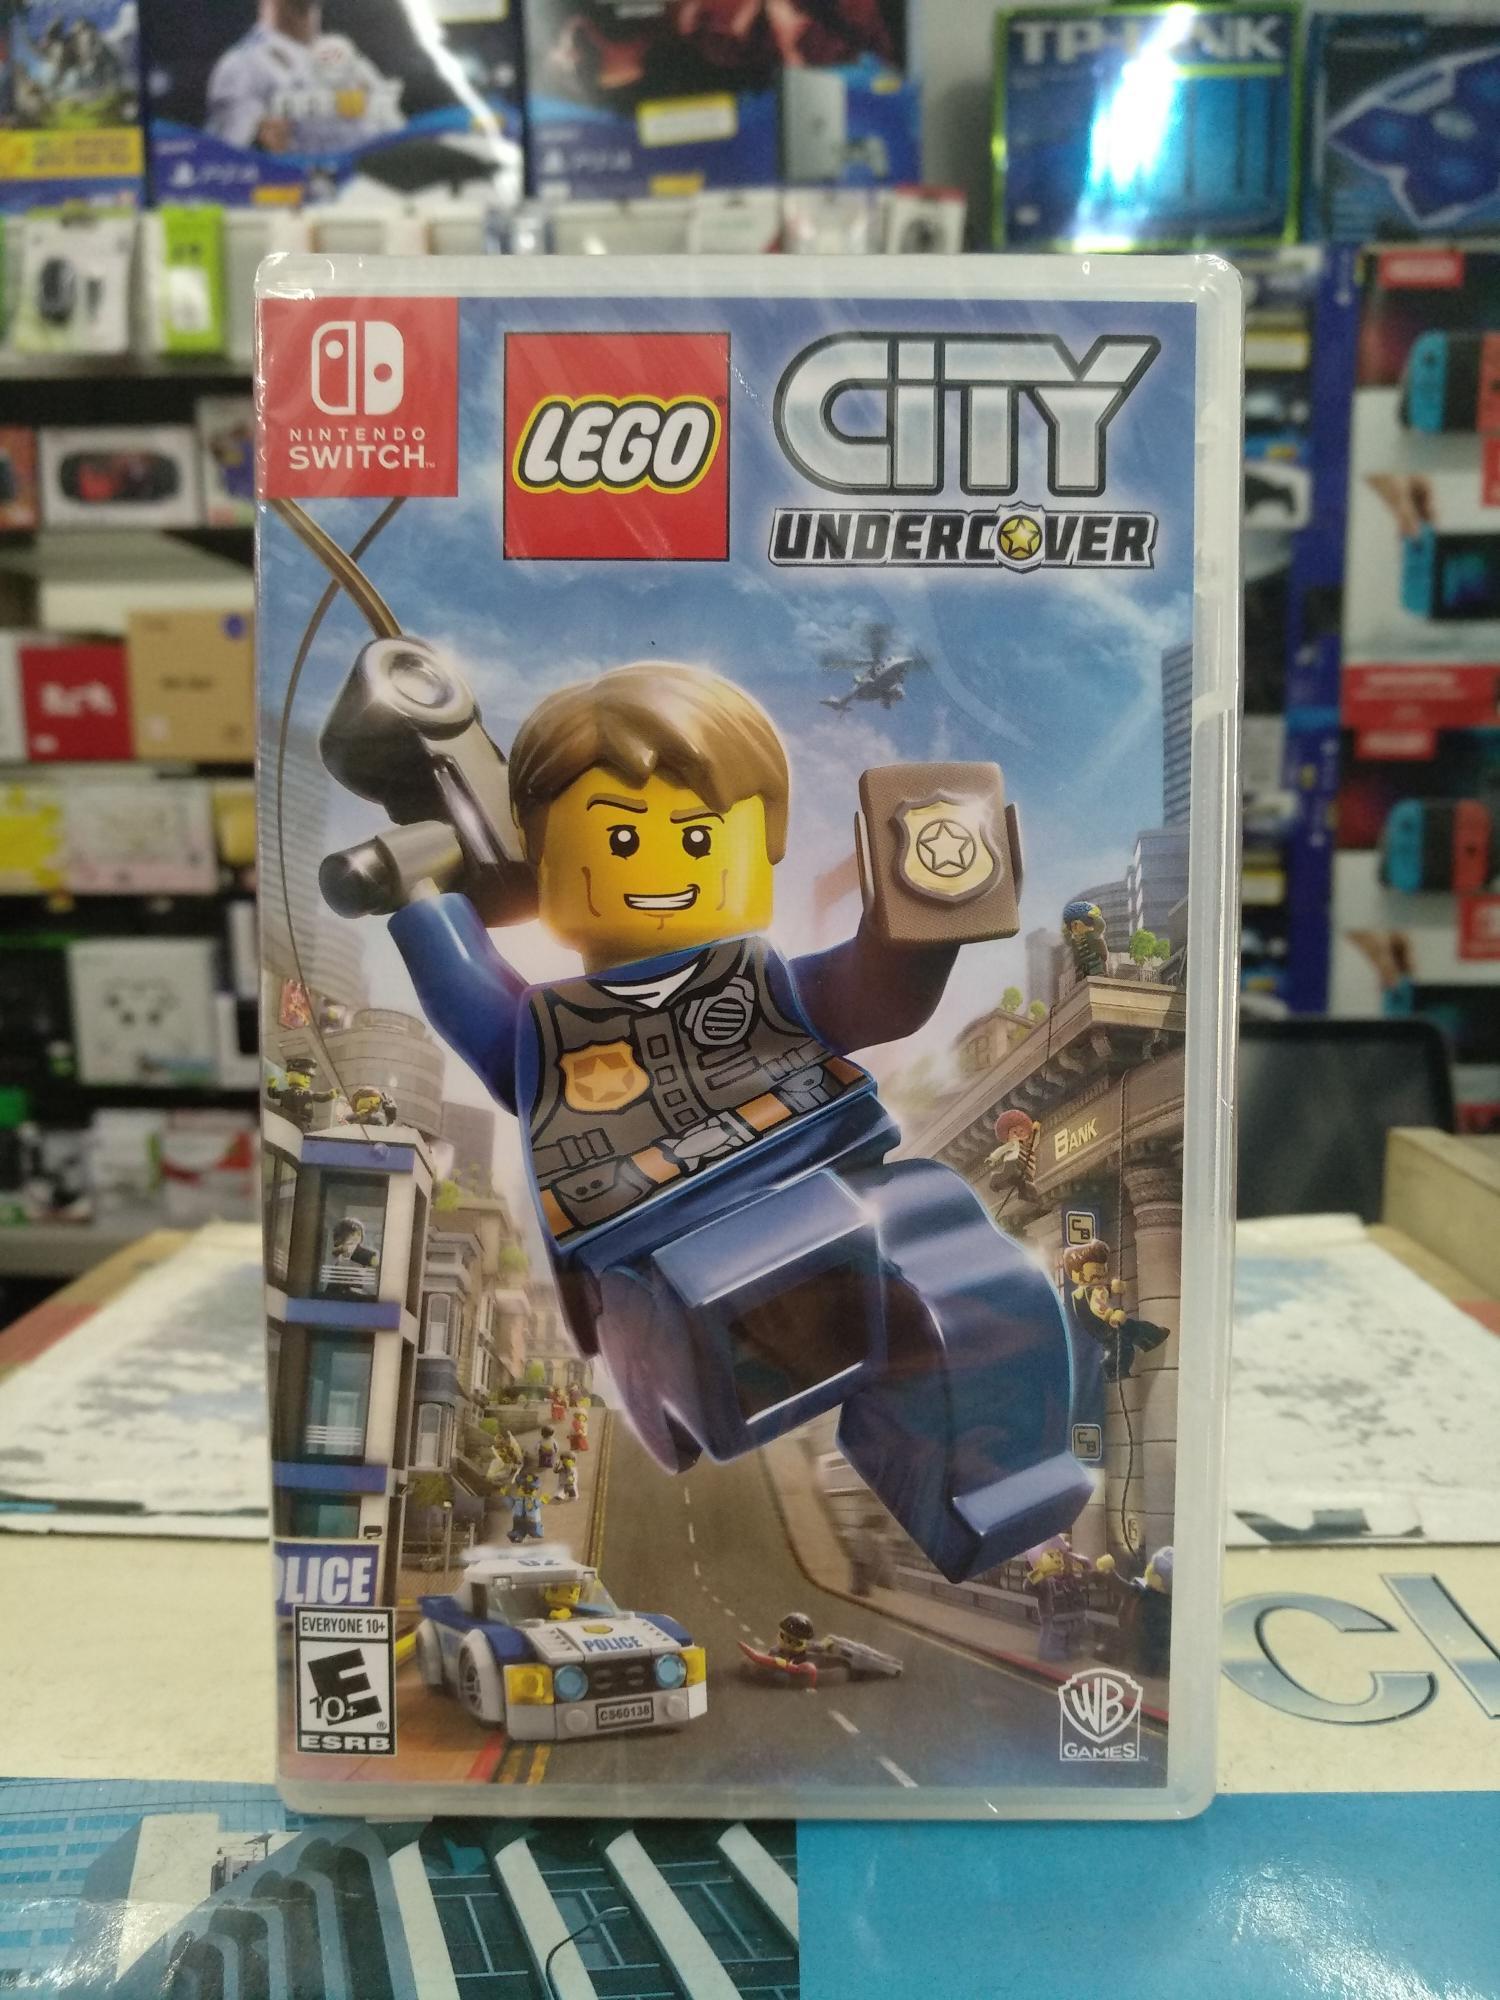 Price Comparison For Nintendo Switch Lego City Undercover